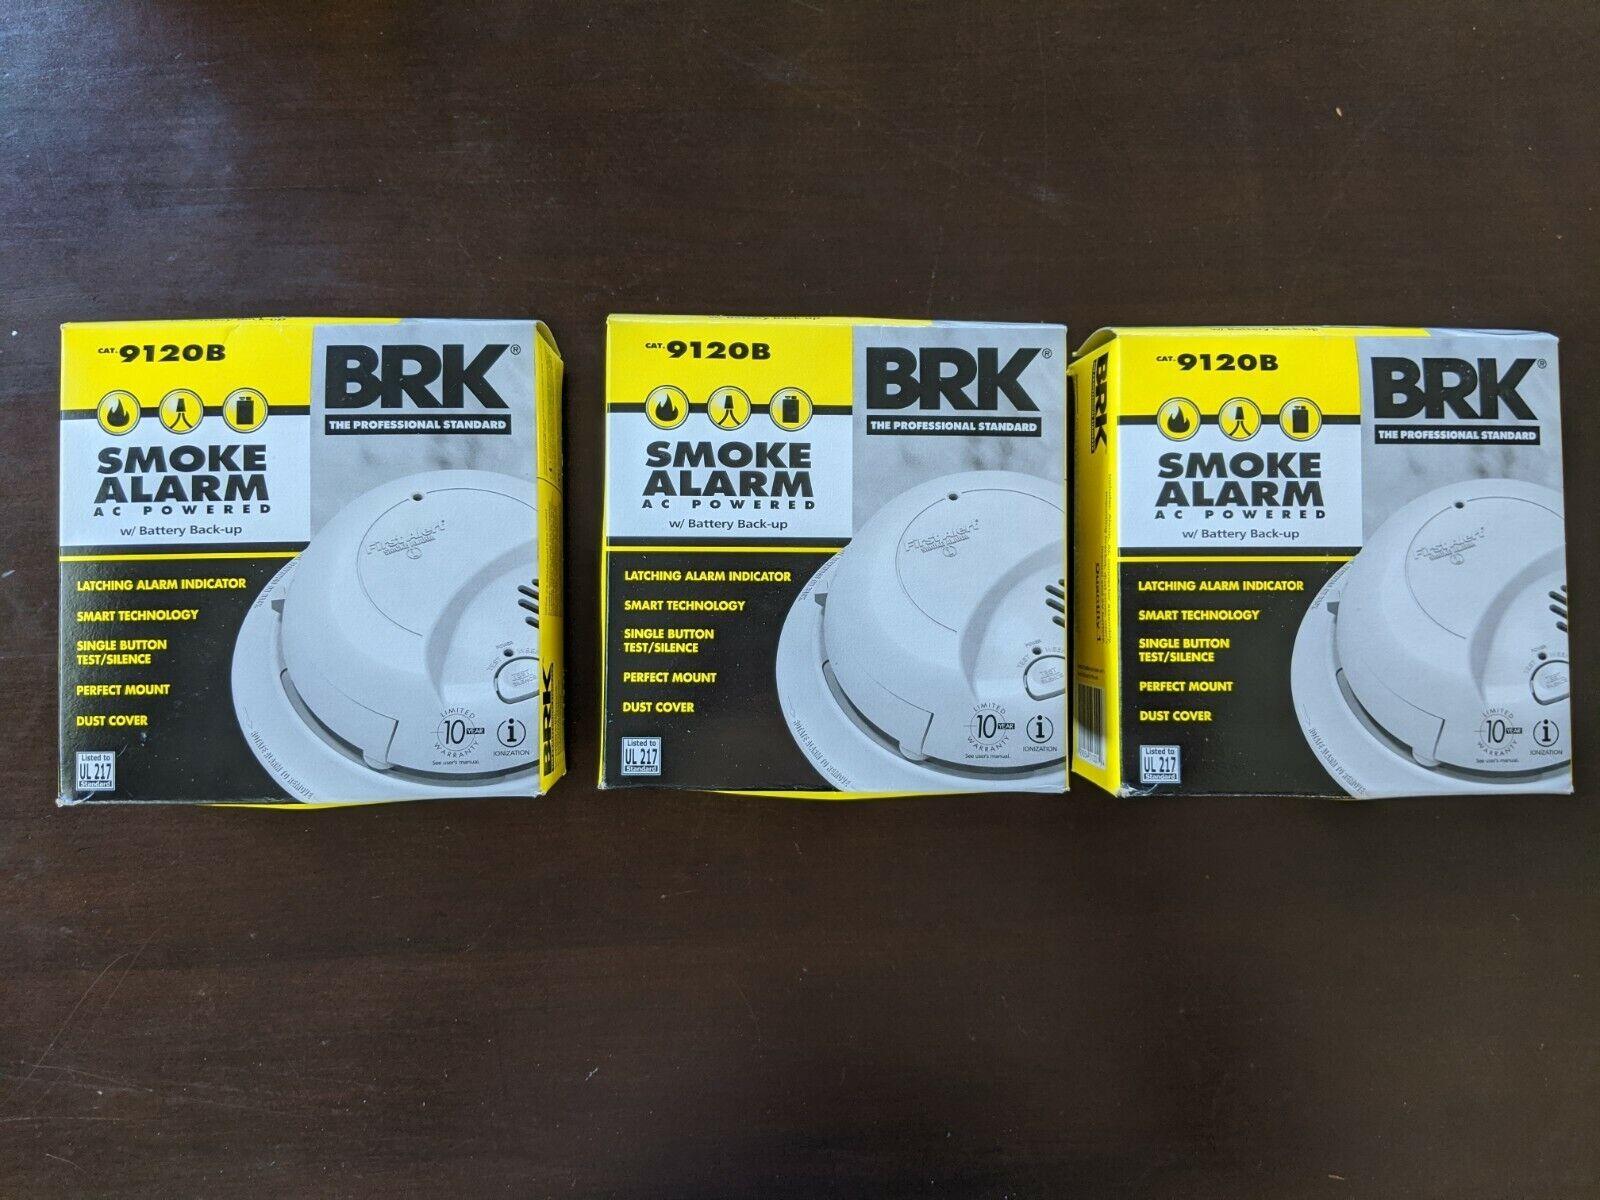 BRK BRANDS/FIRST ALERT 9120B 120V Smoke/Fire Alarm